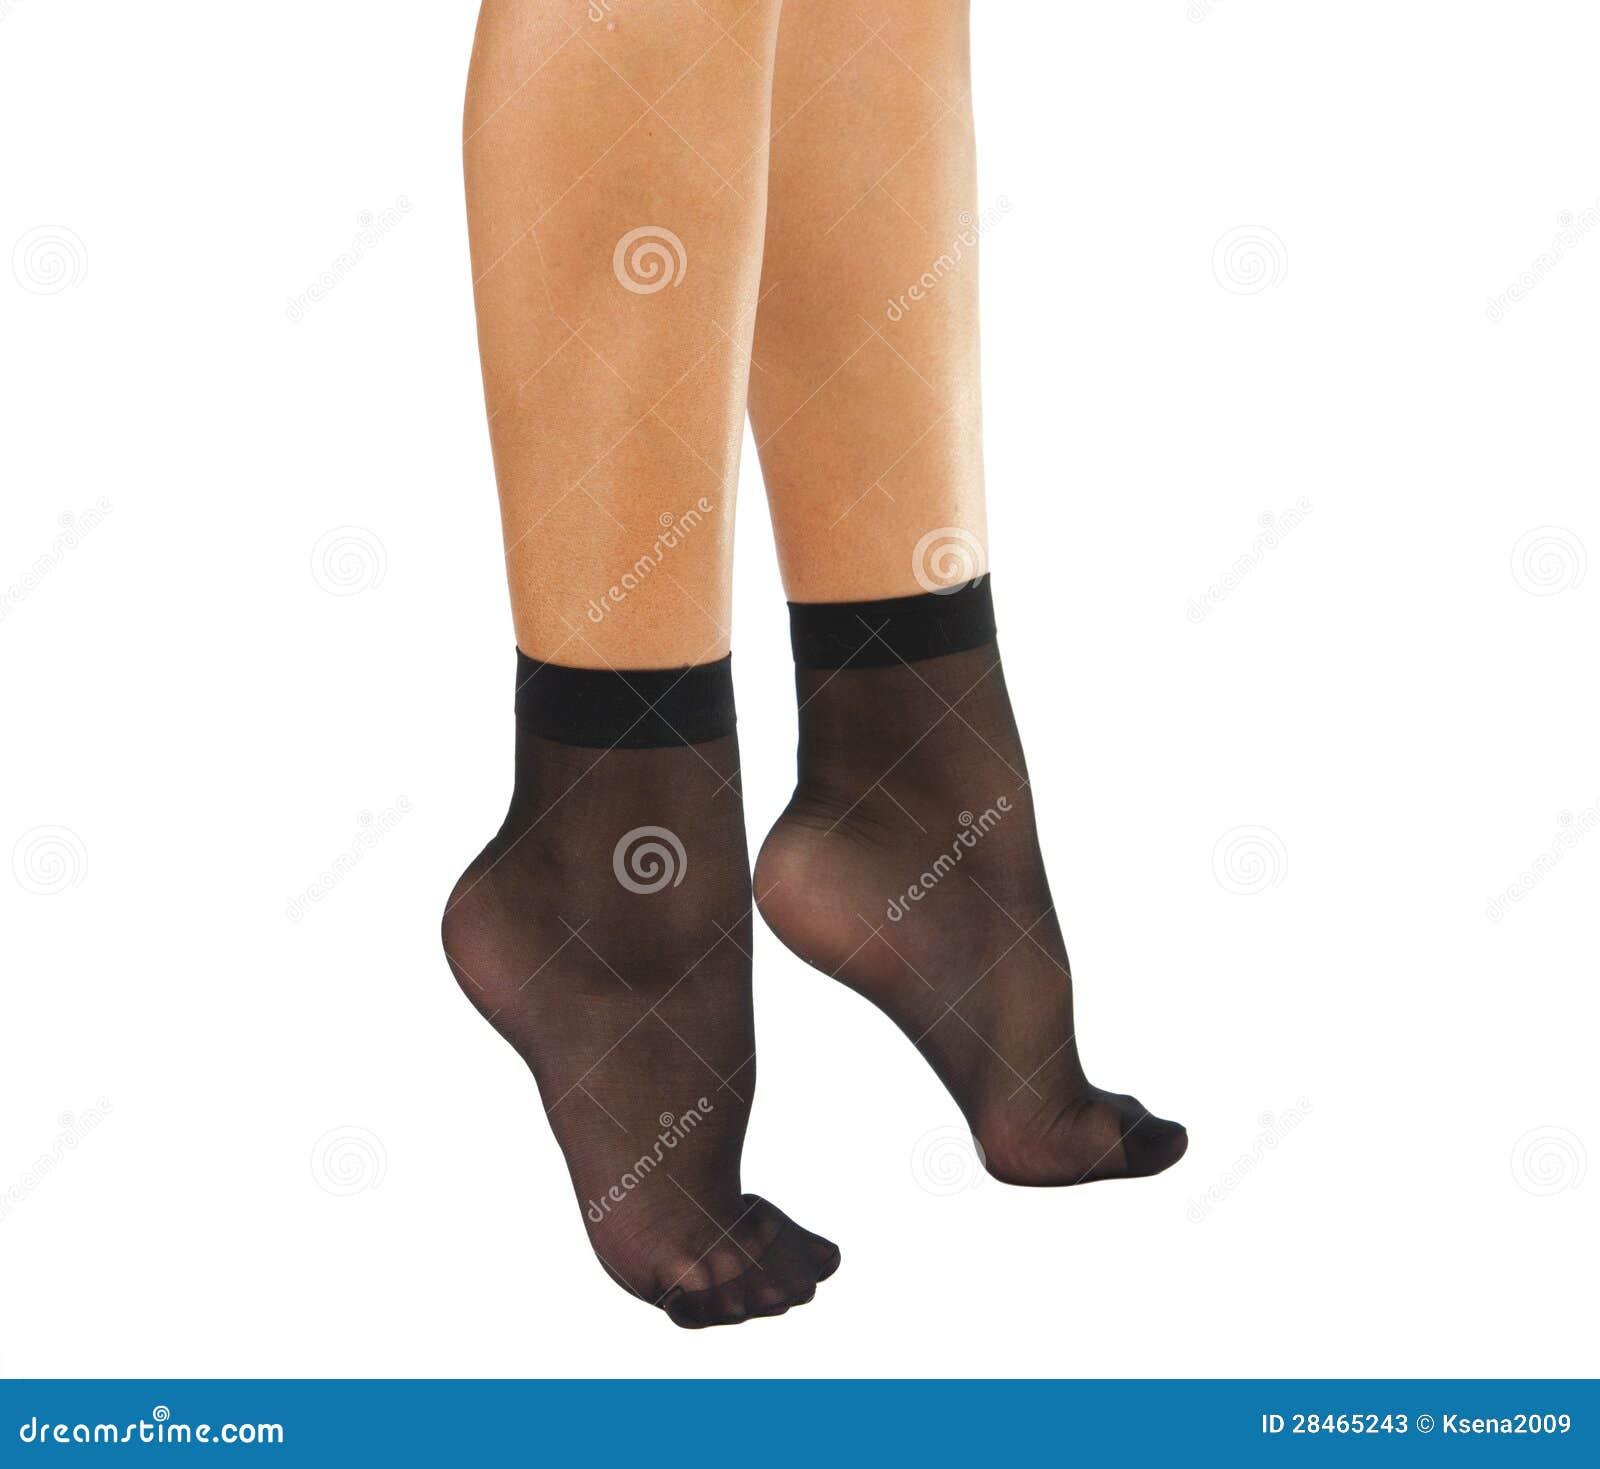 Фото женских ног носки 21 фотография